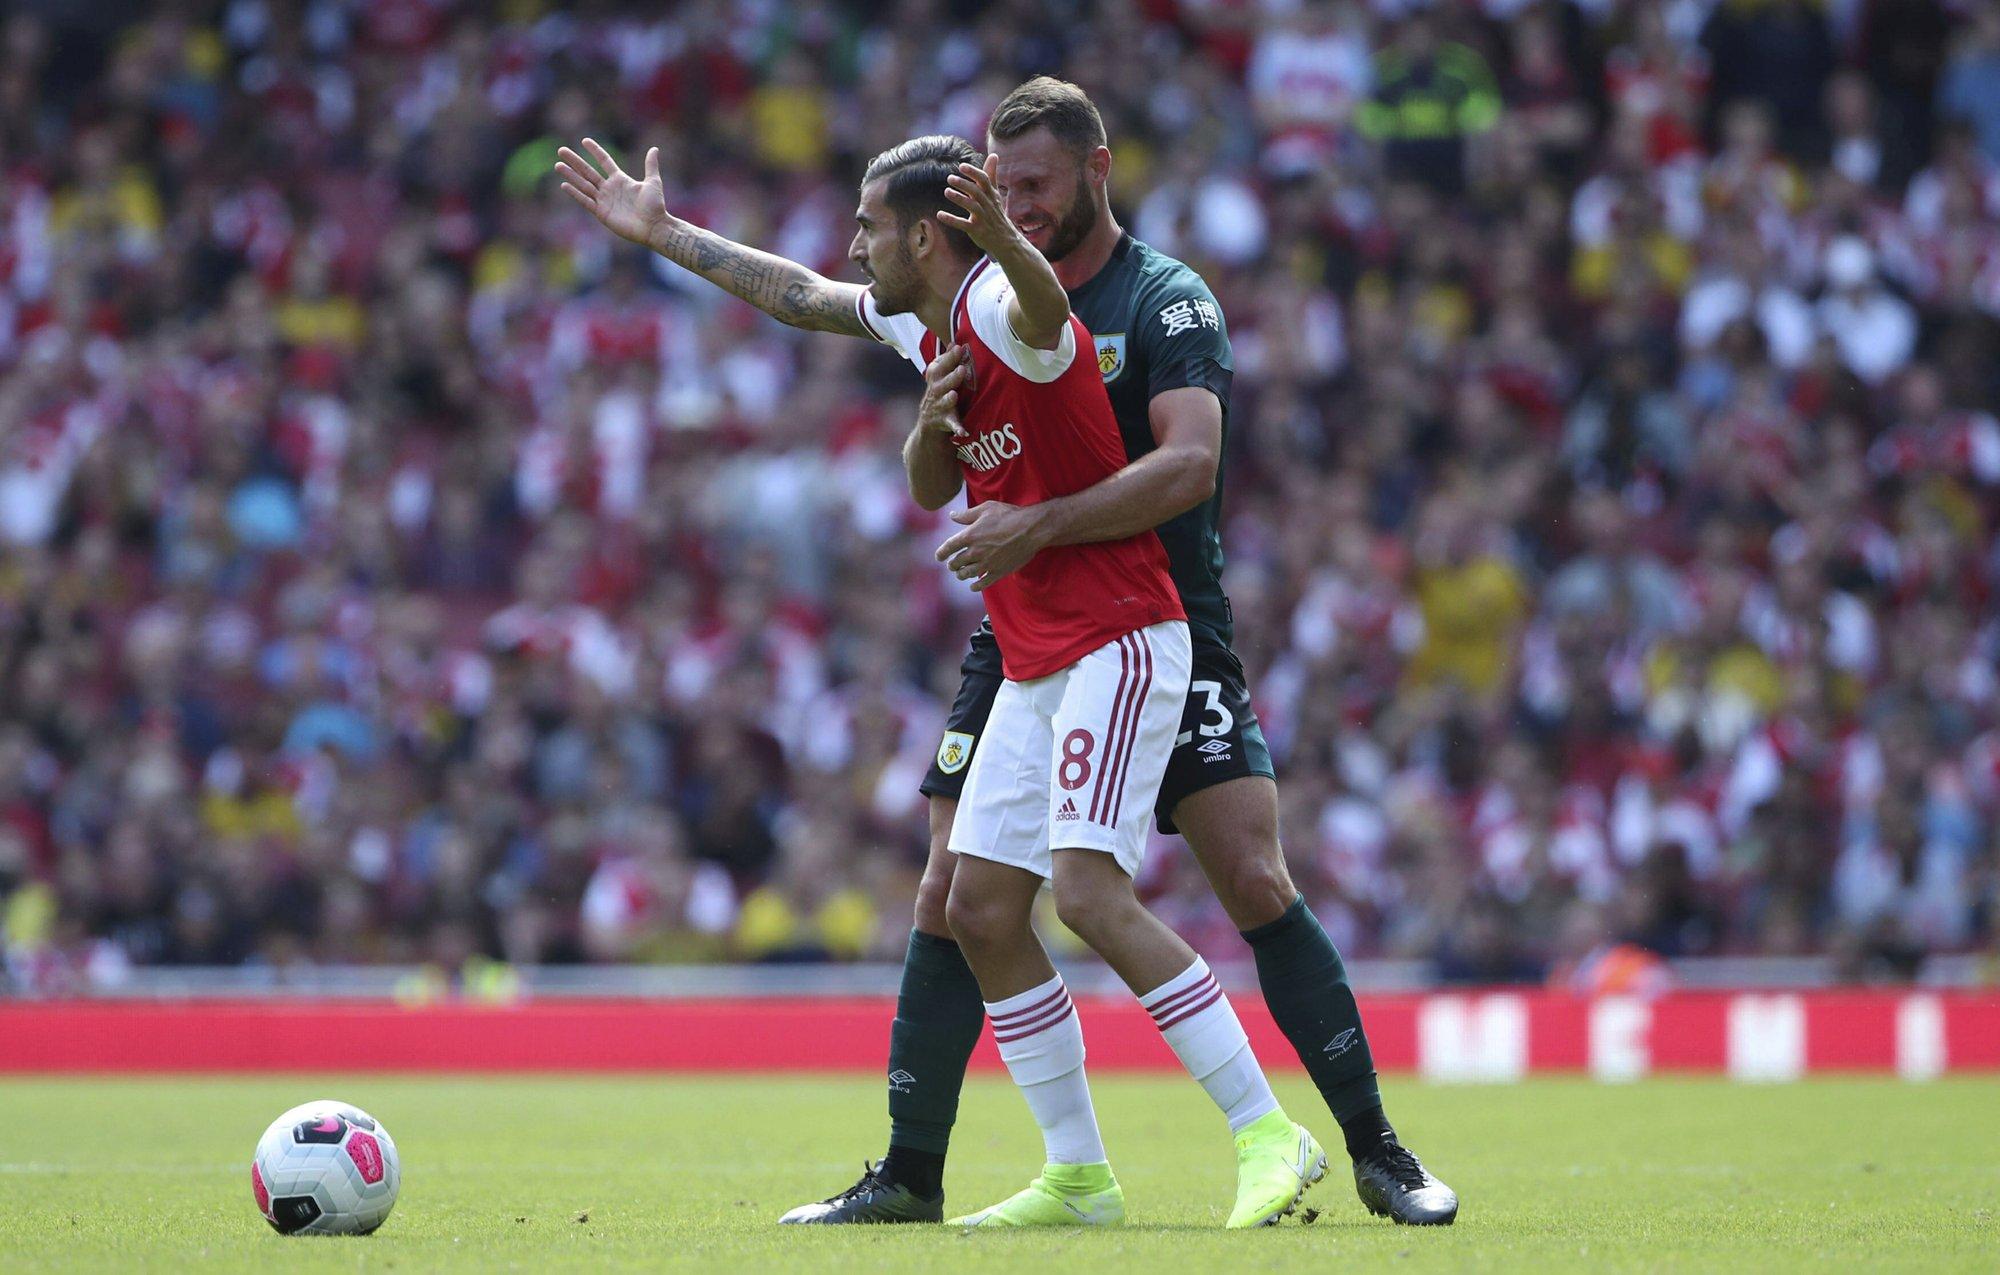 Madrid's loss is Arsenal's gain as playmaker Ceballos shines